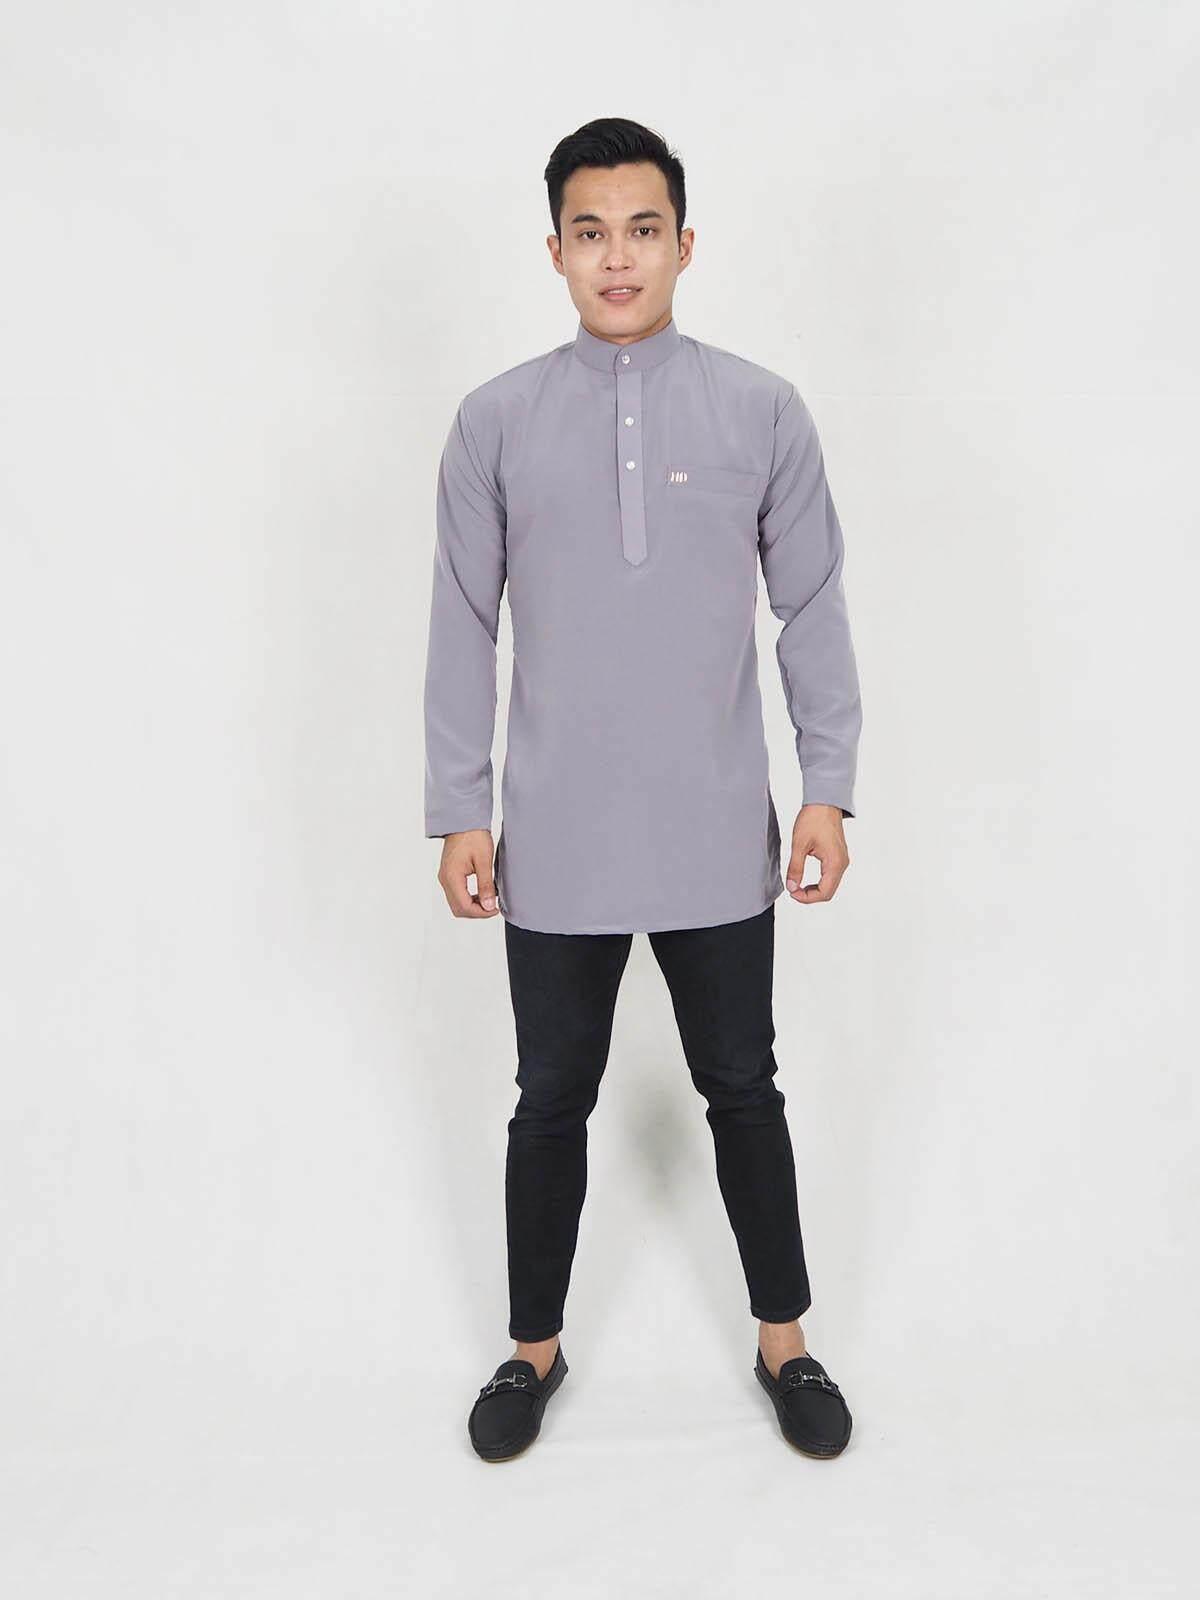 Muslim Men Fashion Moden Slim Fit Kurta / Henrietta Slim Fit Men Top (XXS-XL) / Kurta / Muslimin Kurta / Ready Stock / Muslimin Men Kurta Raya 2020 / Murah / Ship from Malaysia / Hot Product